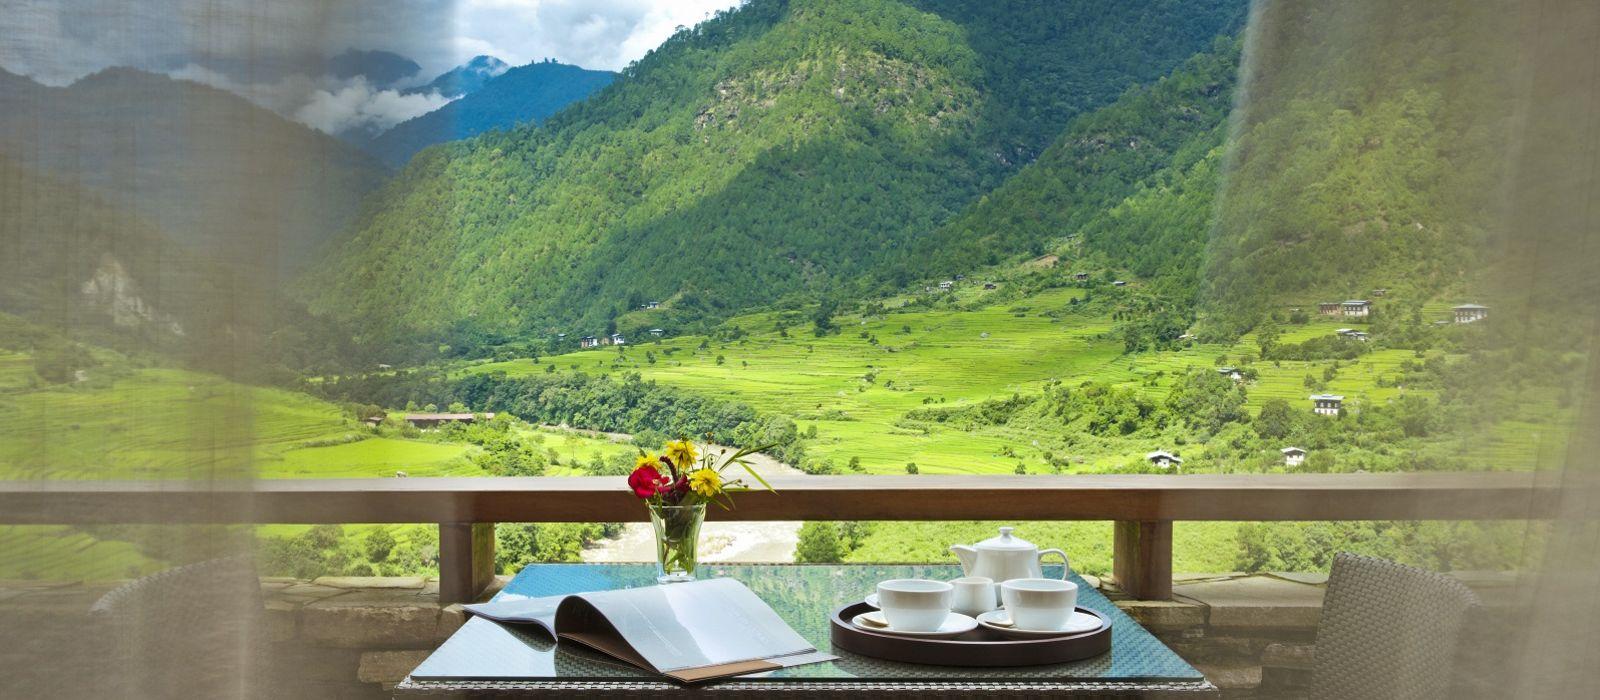 Bhutan Luxusreise Urlaub 5